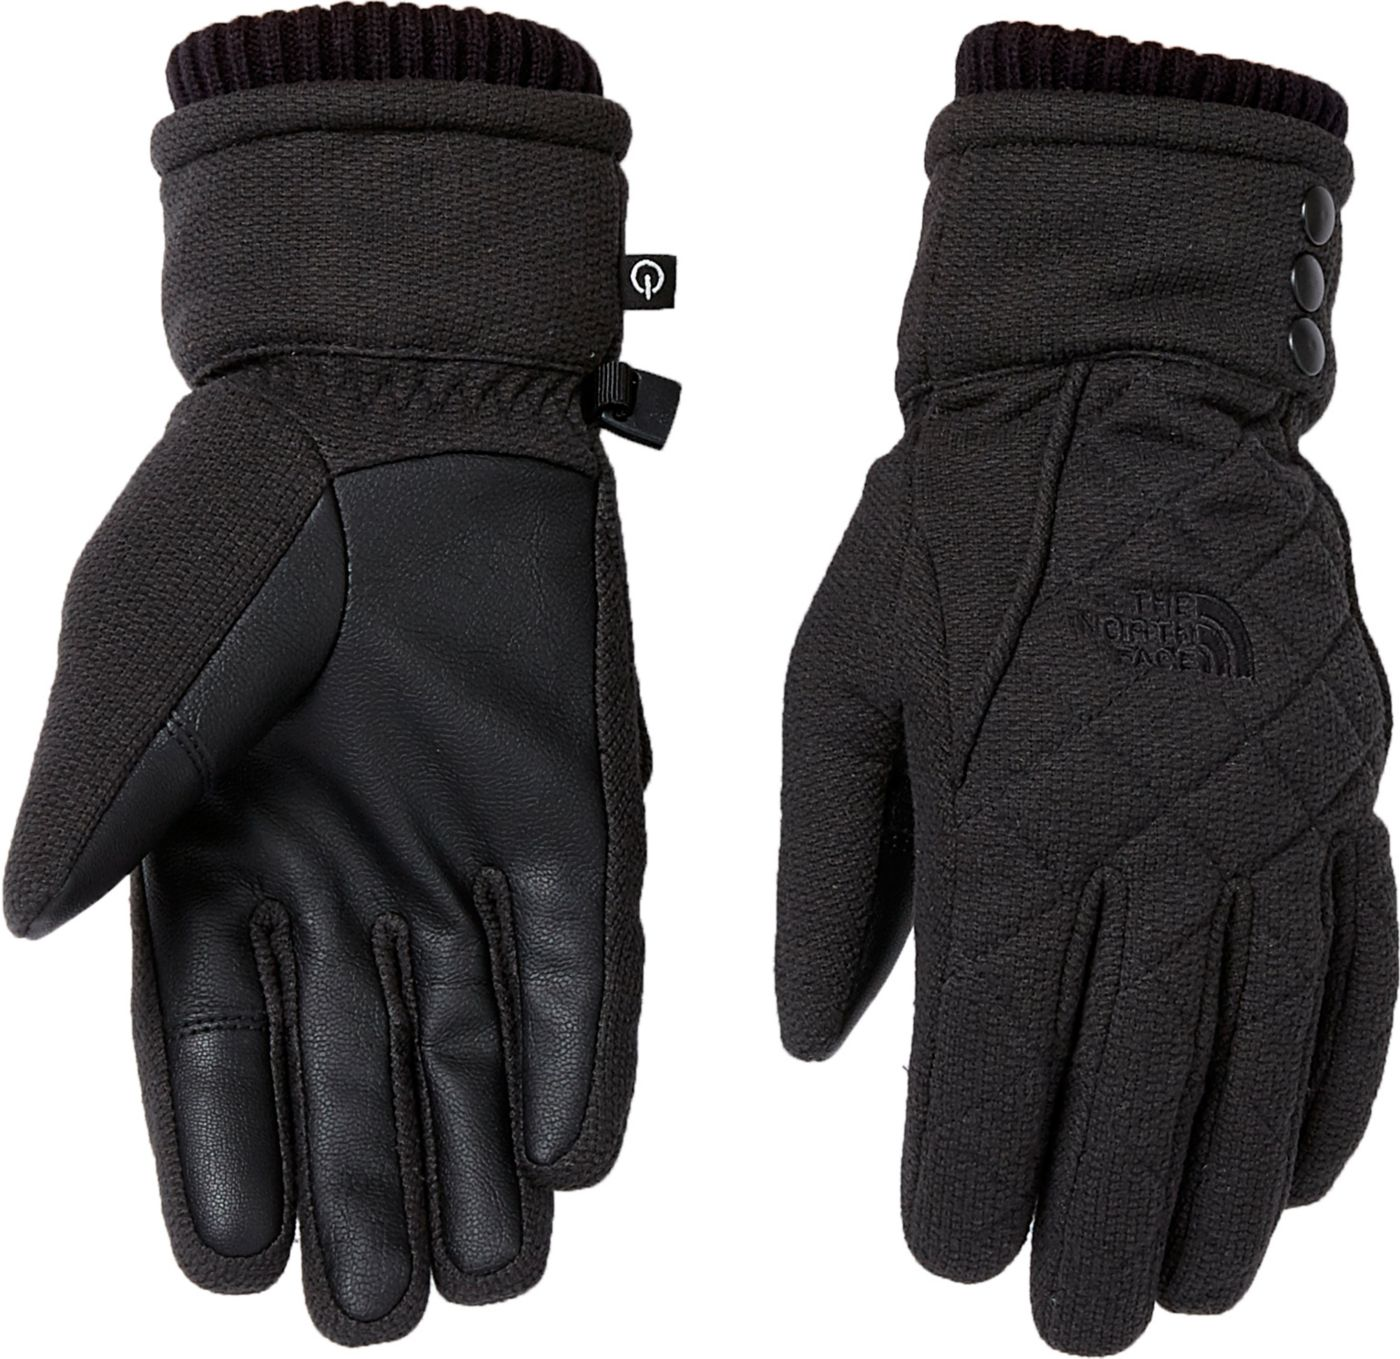 7f73618e9 The North Face Women's Caroluna Etip Gloves